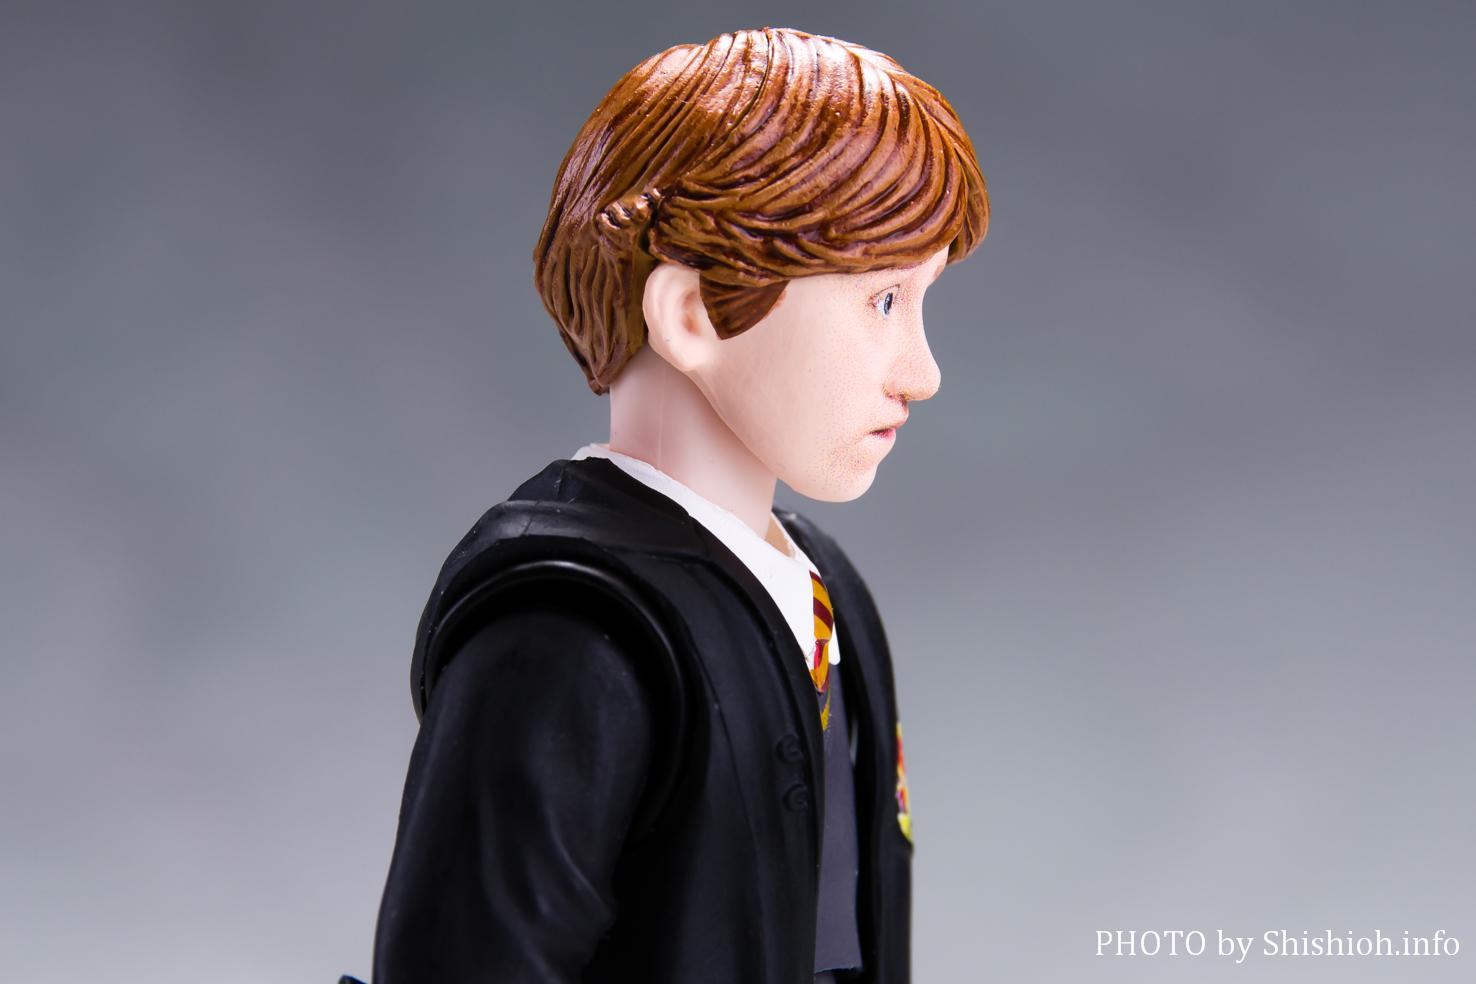 S.H.Figuarts ロン・ウィーズリー (ハリー・ポッターと賢者の石)